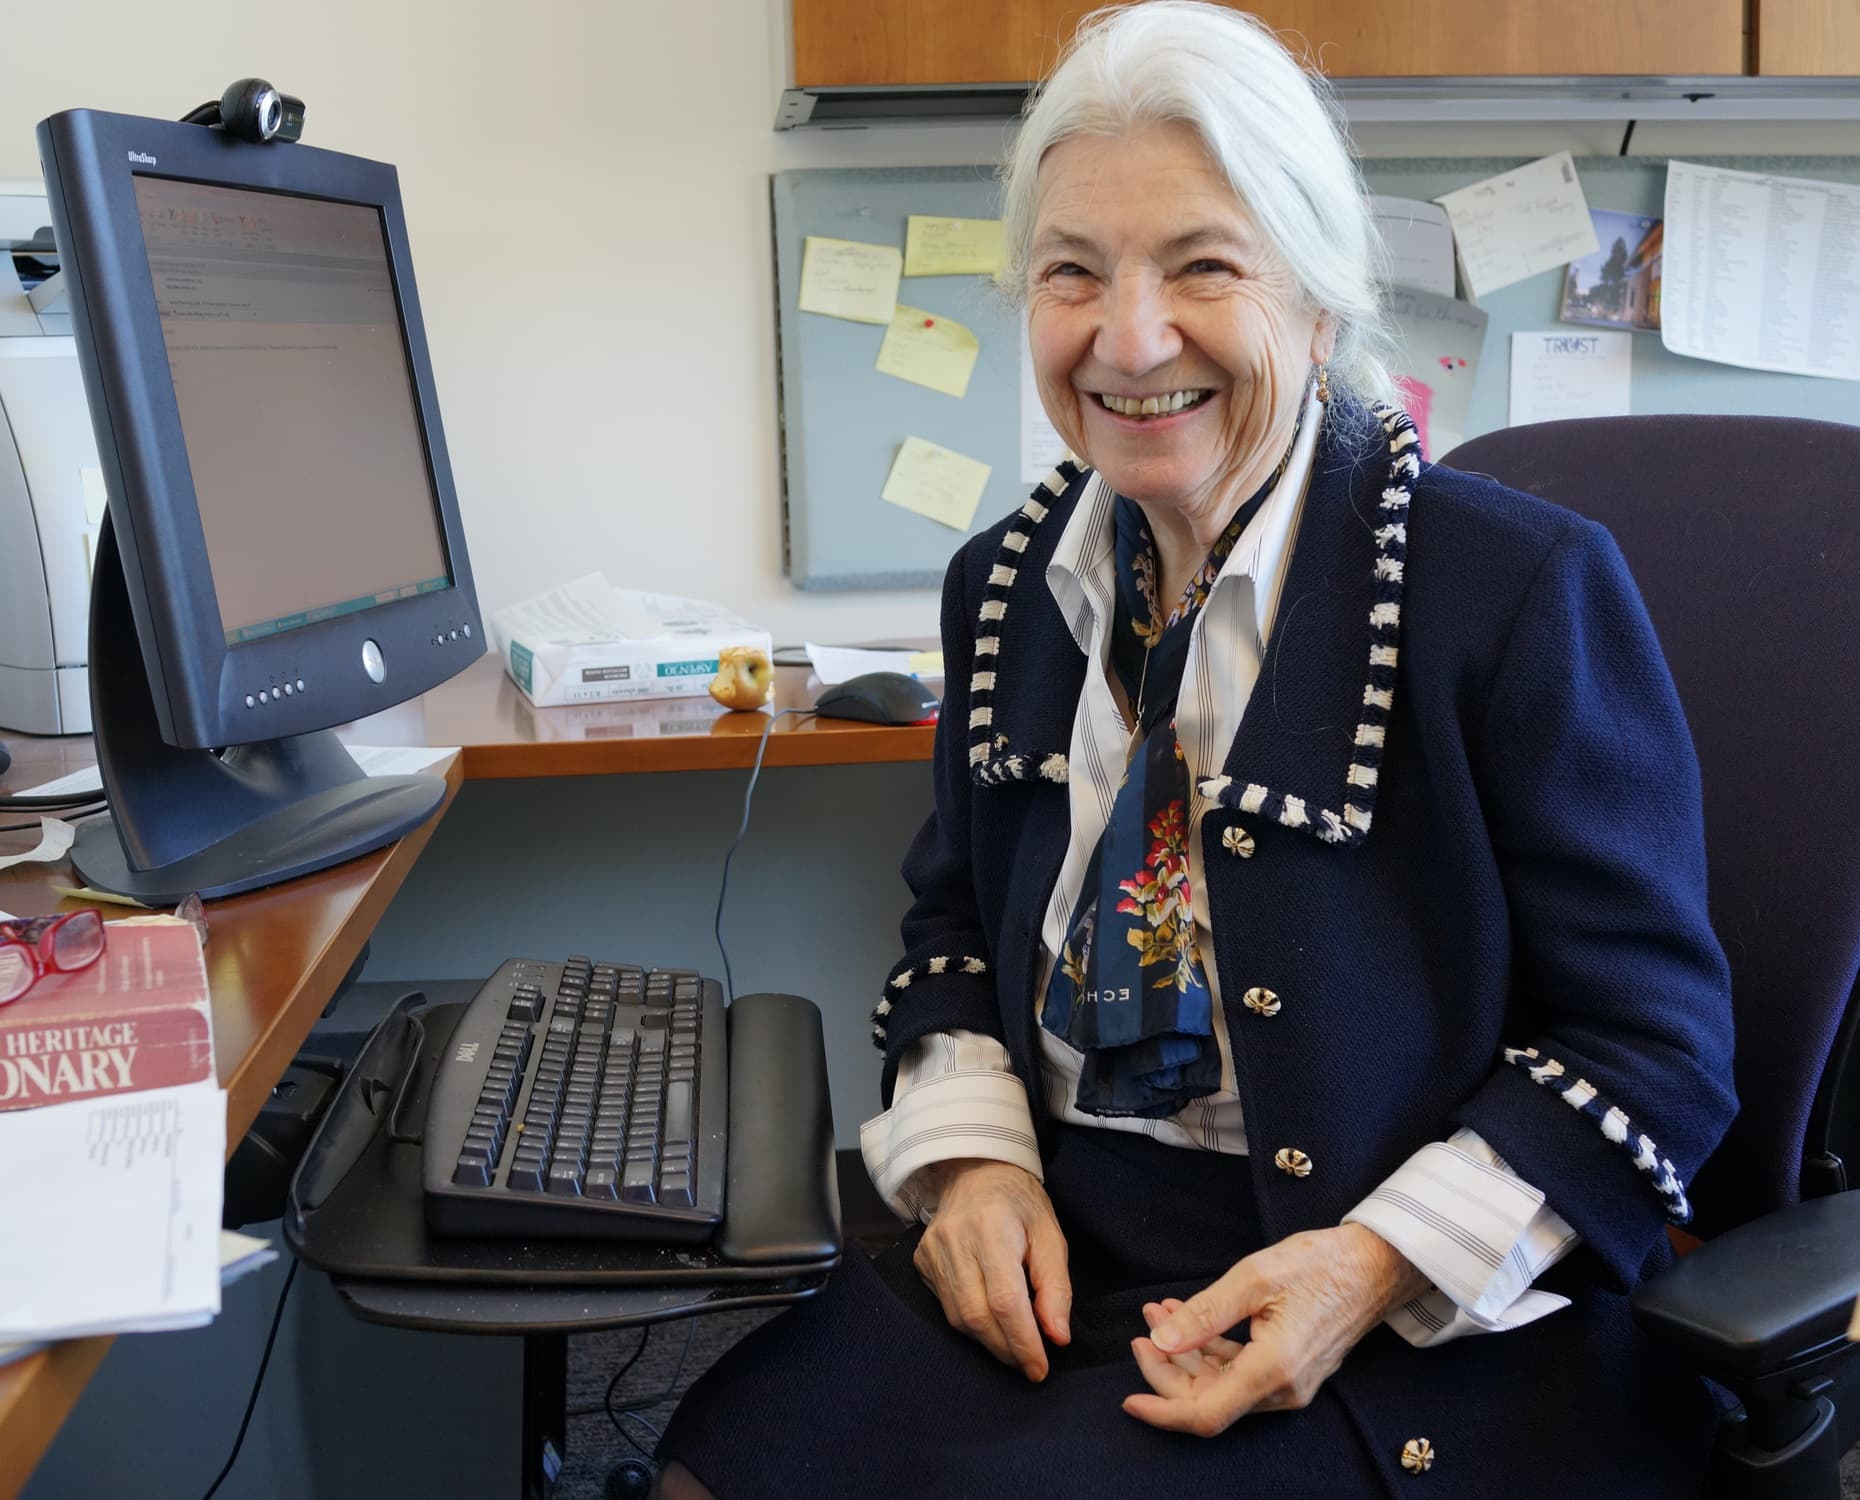 Fotografie von Ruzena Bajcsy in ihrem Büro an der University of California, Berkeley